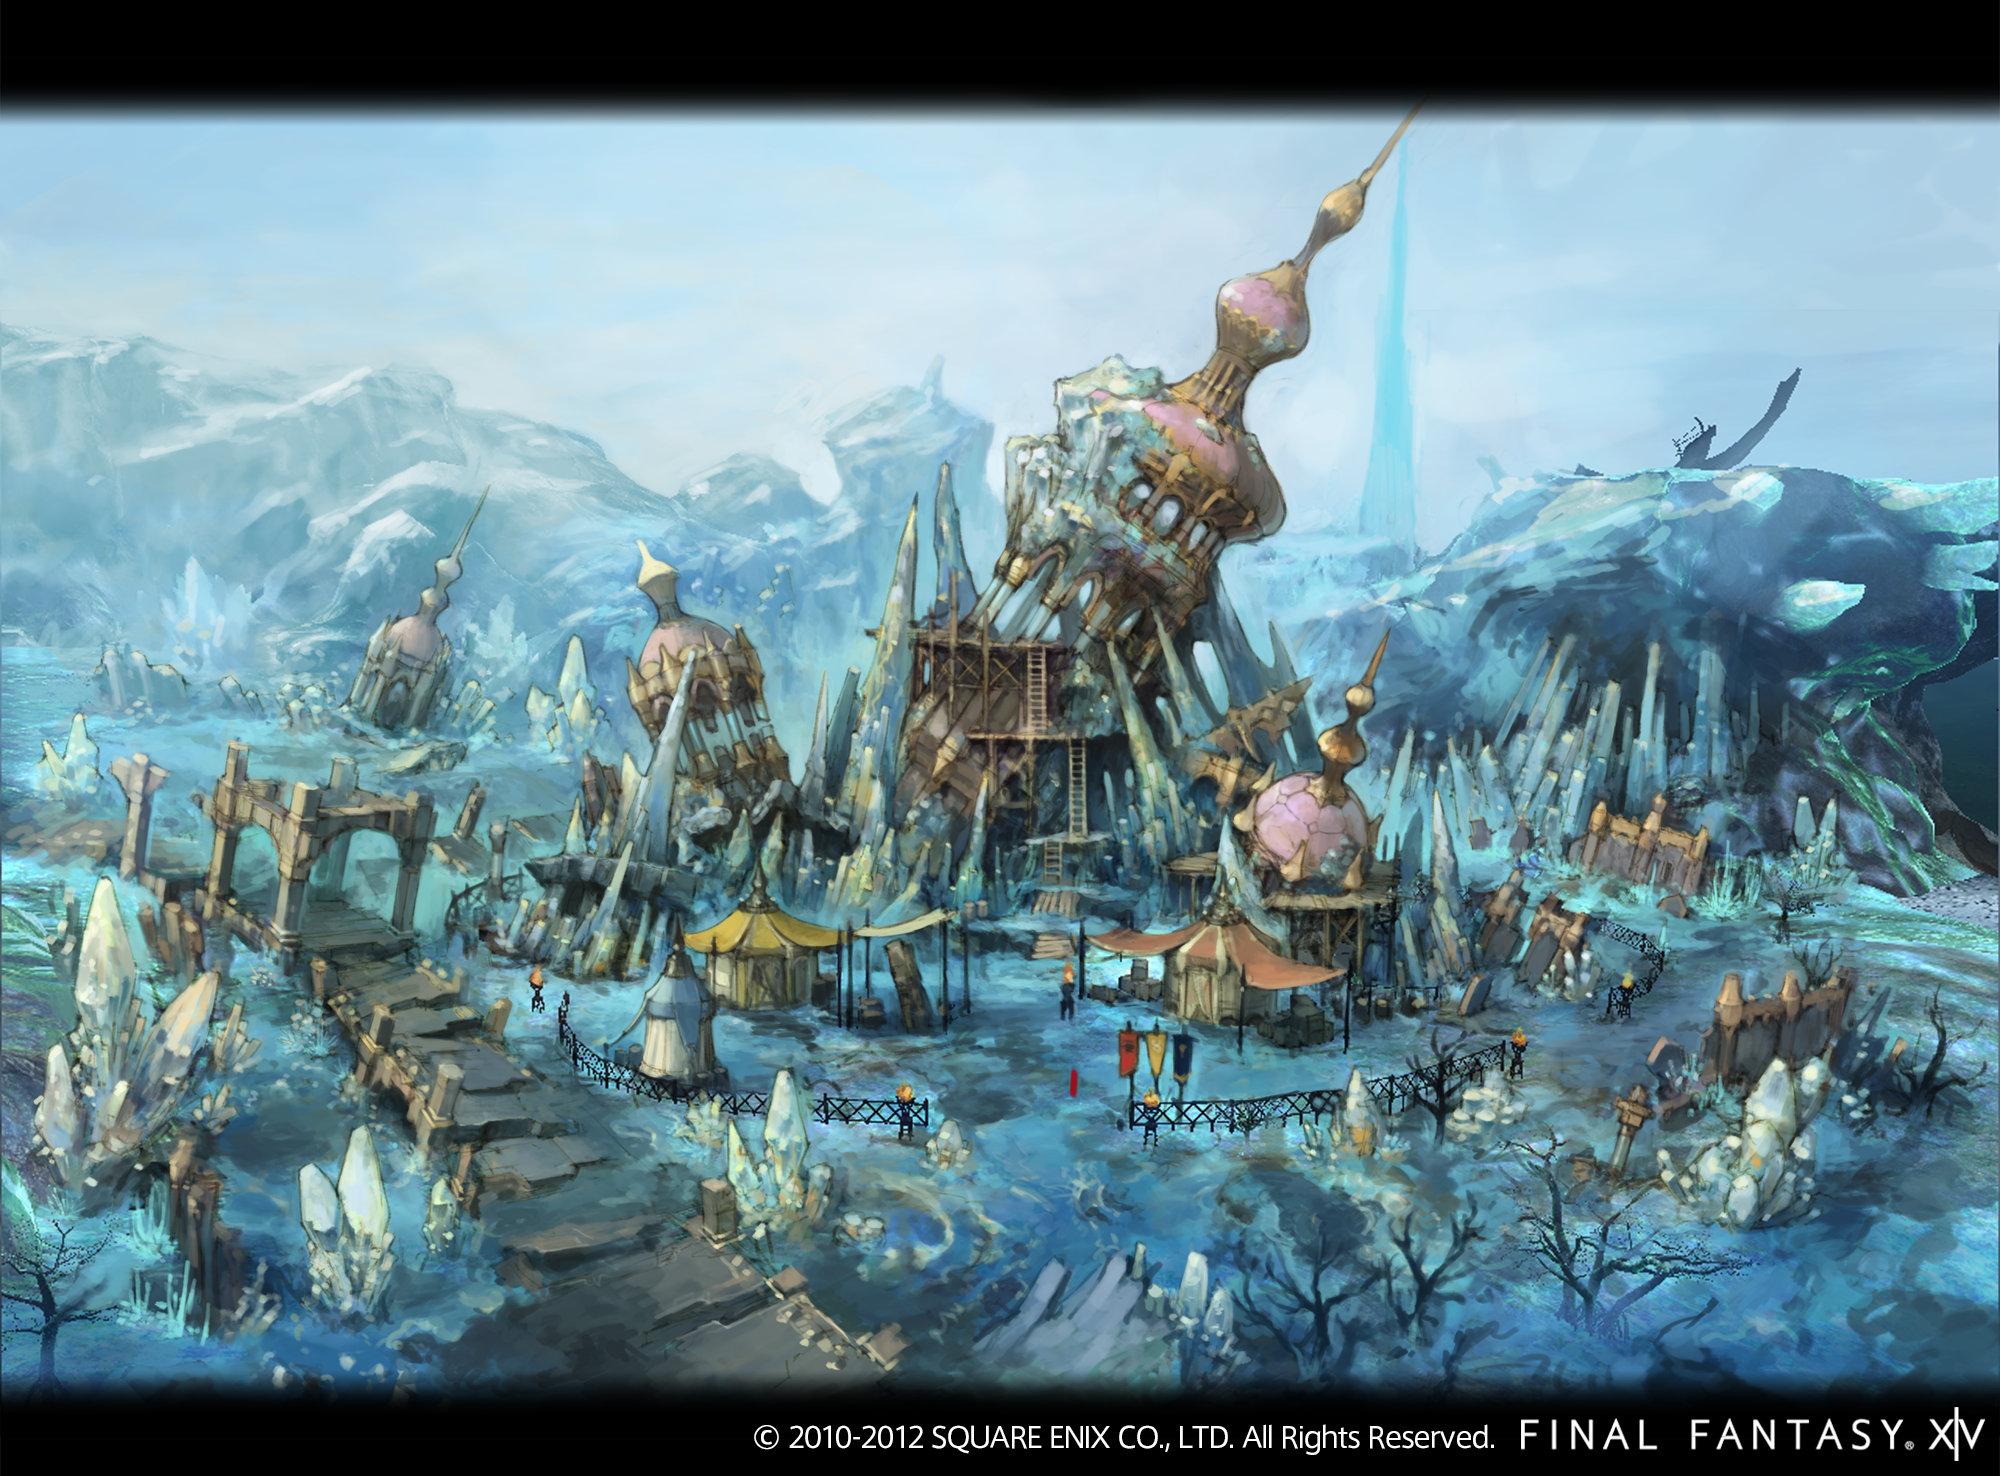 4gamer xiv 14 ff14 final fantasy xiv voltagebd Image collections